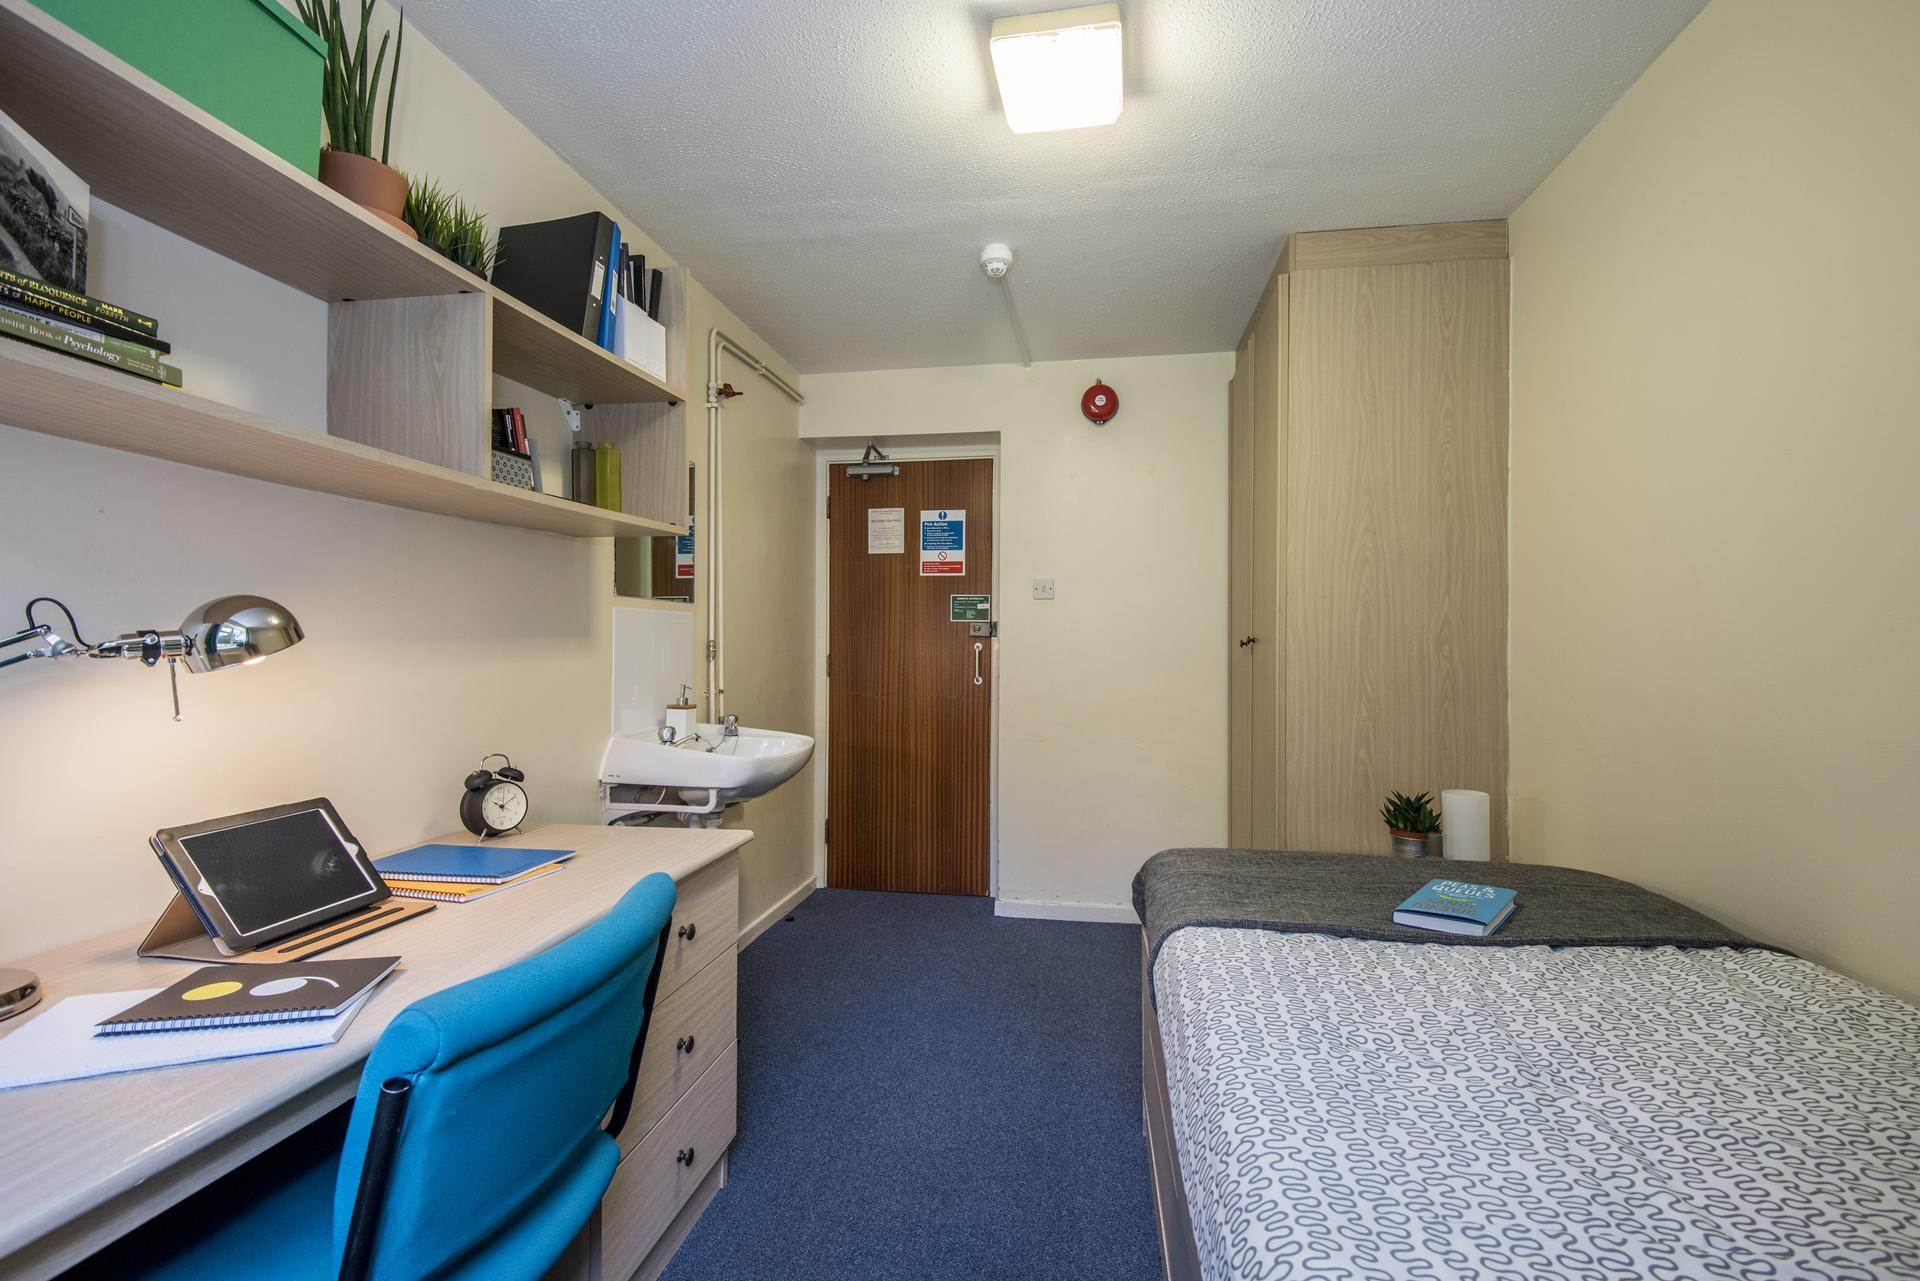 En Suite Rooms: Non-en Suite Room Category 2